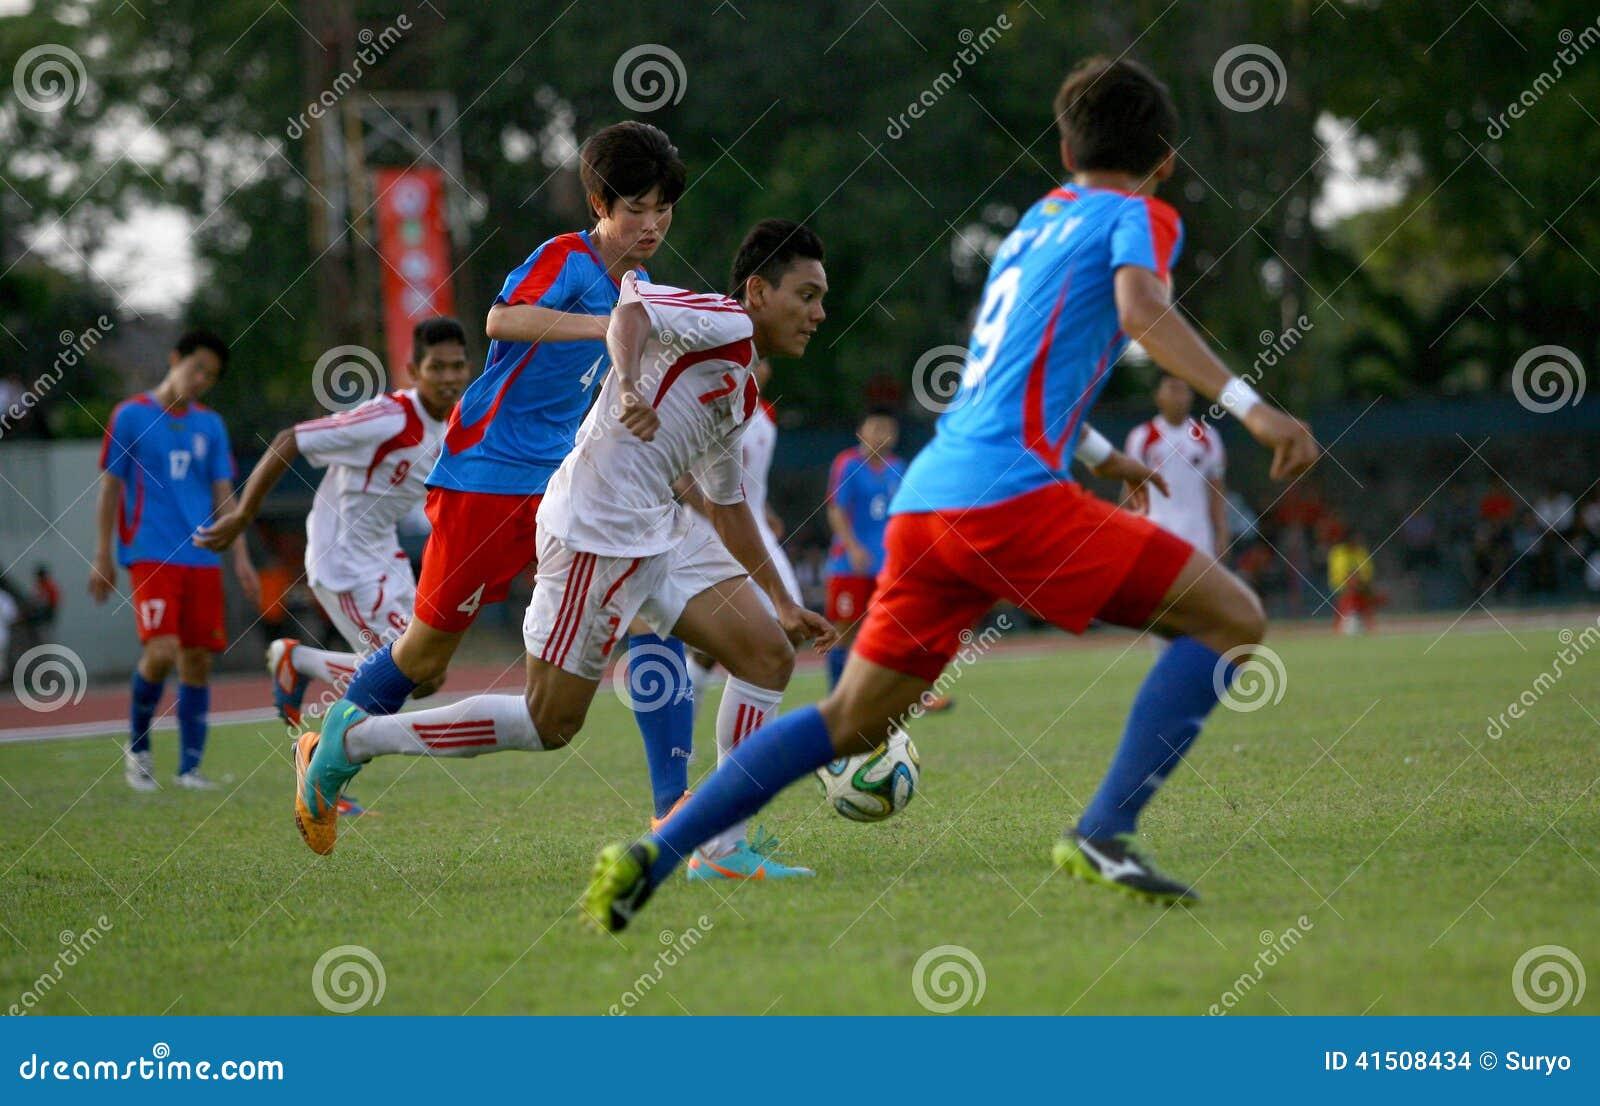 Soccer editorial stock image  Image of white, korean - 41508434